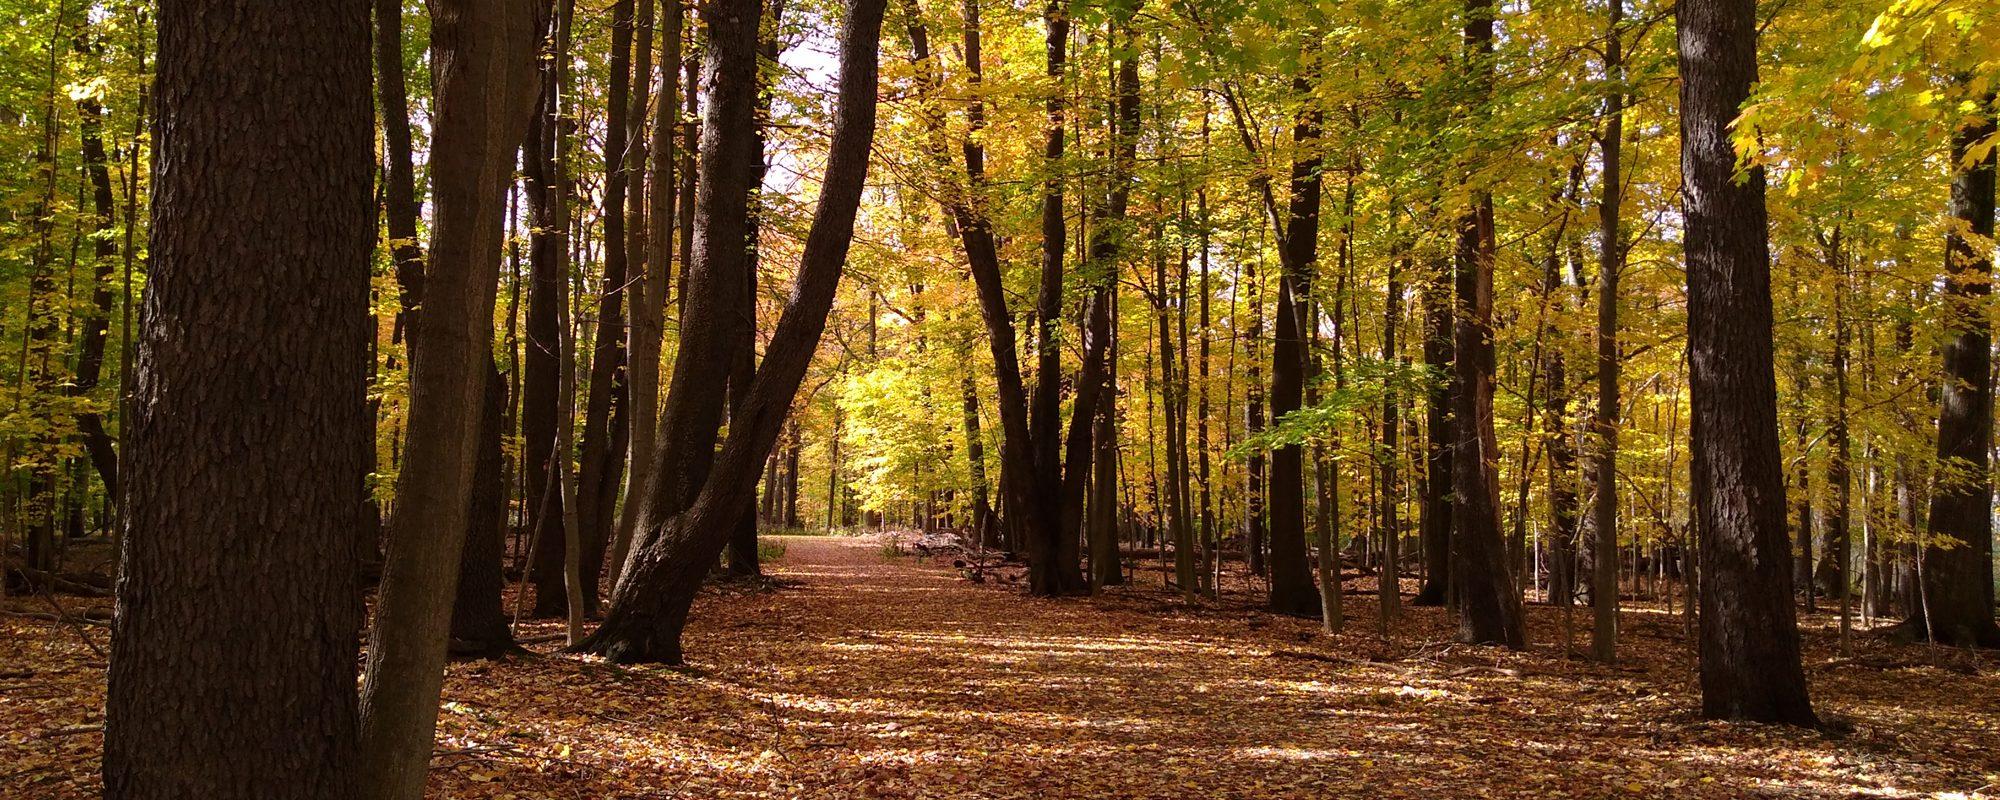 Reinstein Woods Nature Preserve Depew Ny